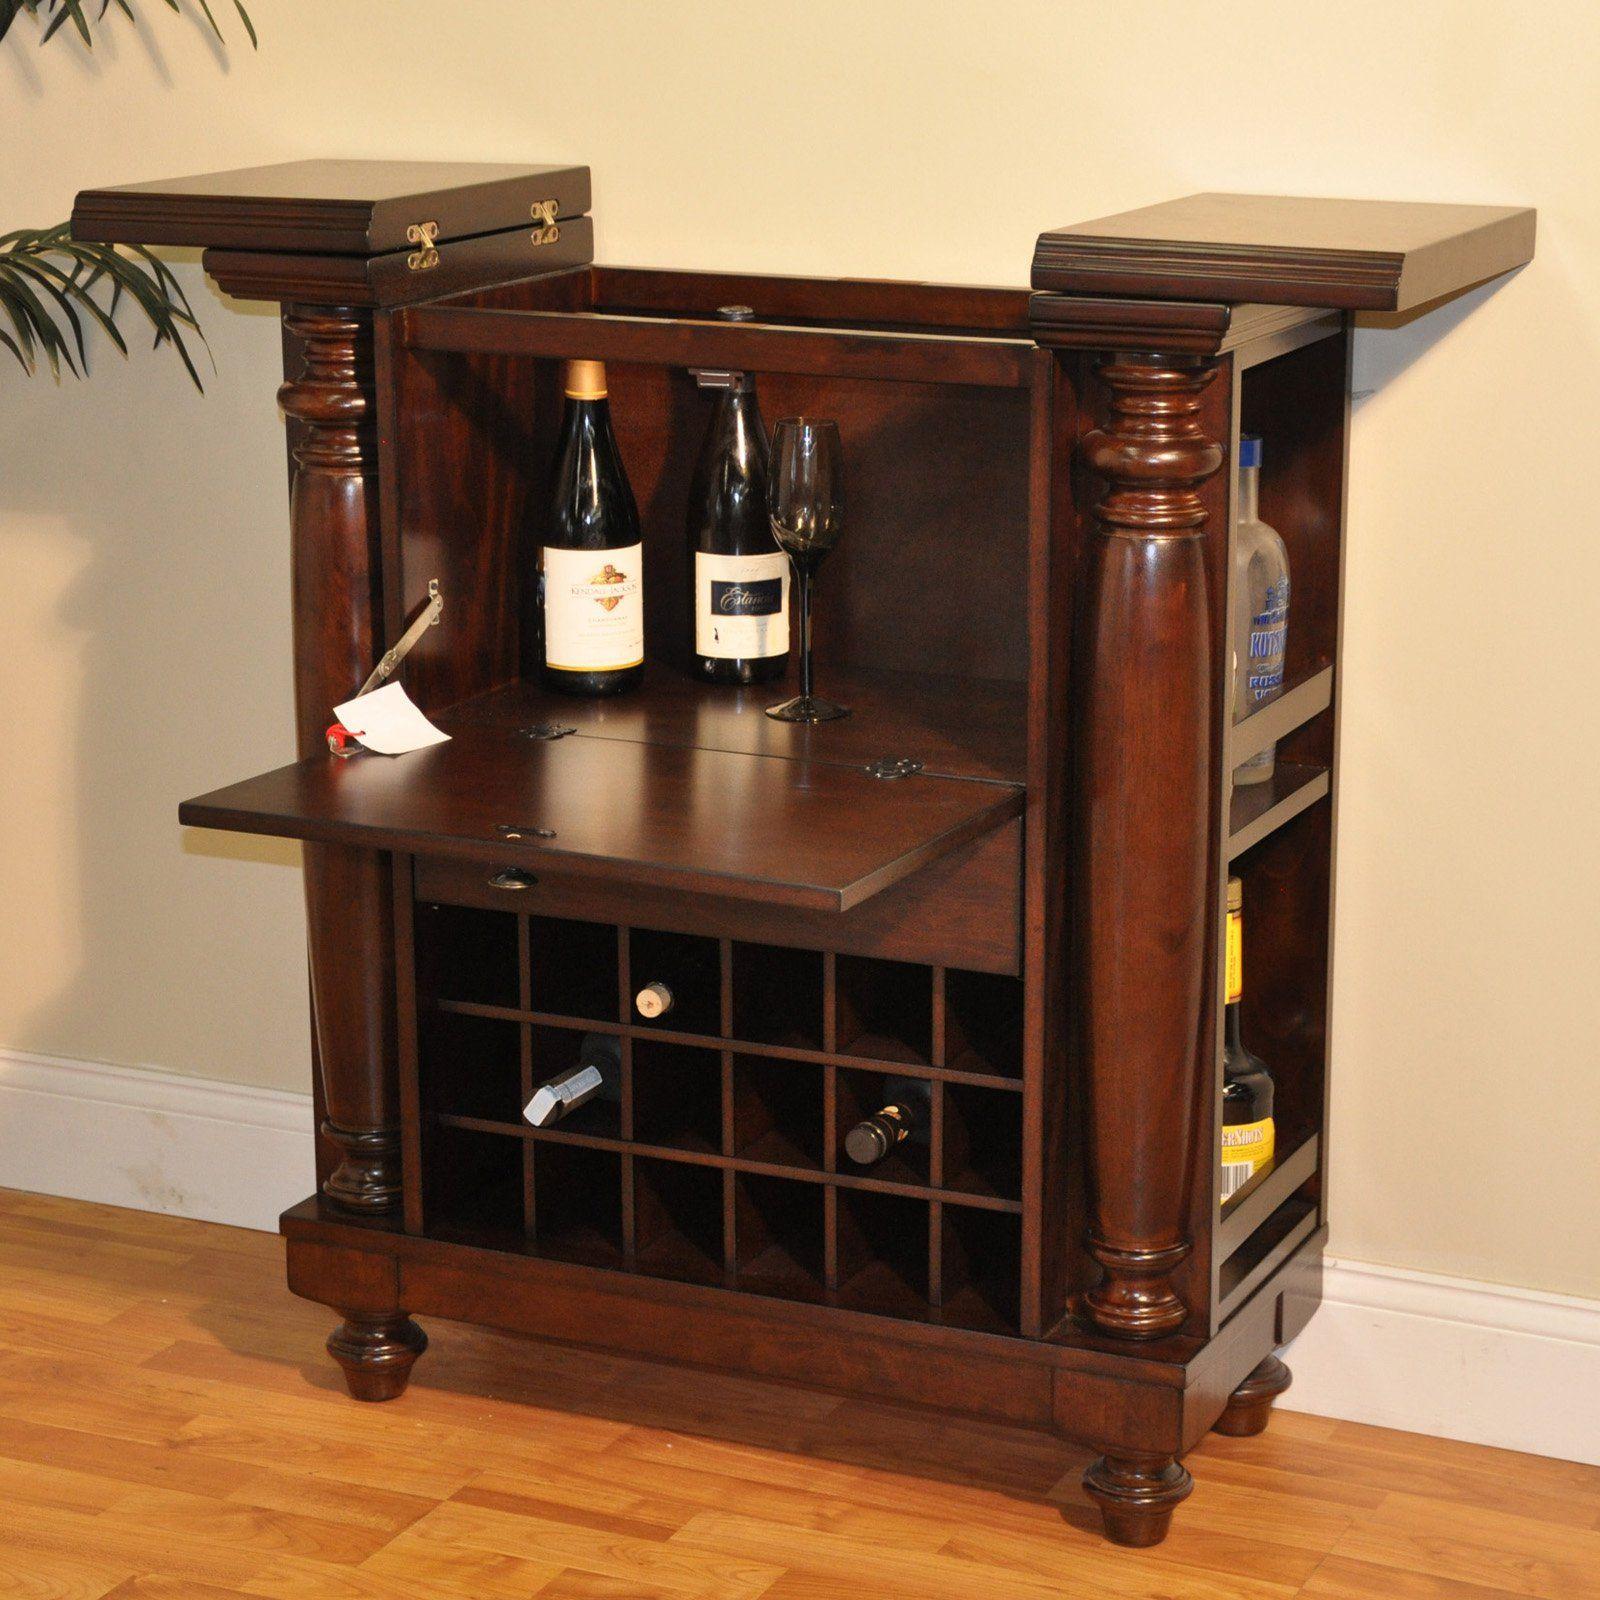 Williamsburg Flip Top Bar Cabinet   Rustic Mahogany   Convenient Home Bar  Storage Is Seldom As